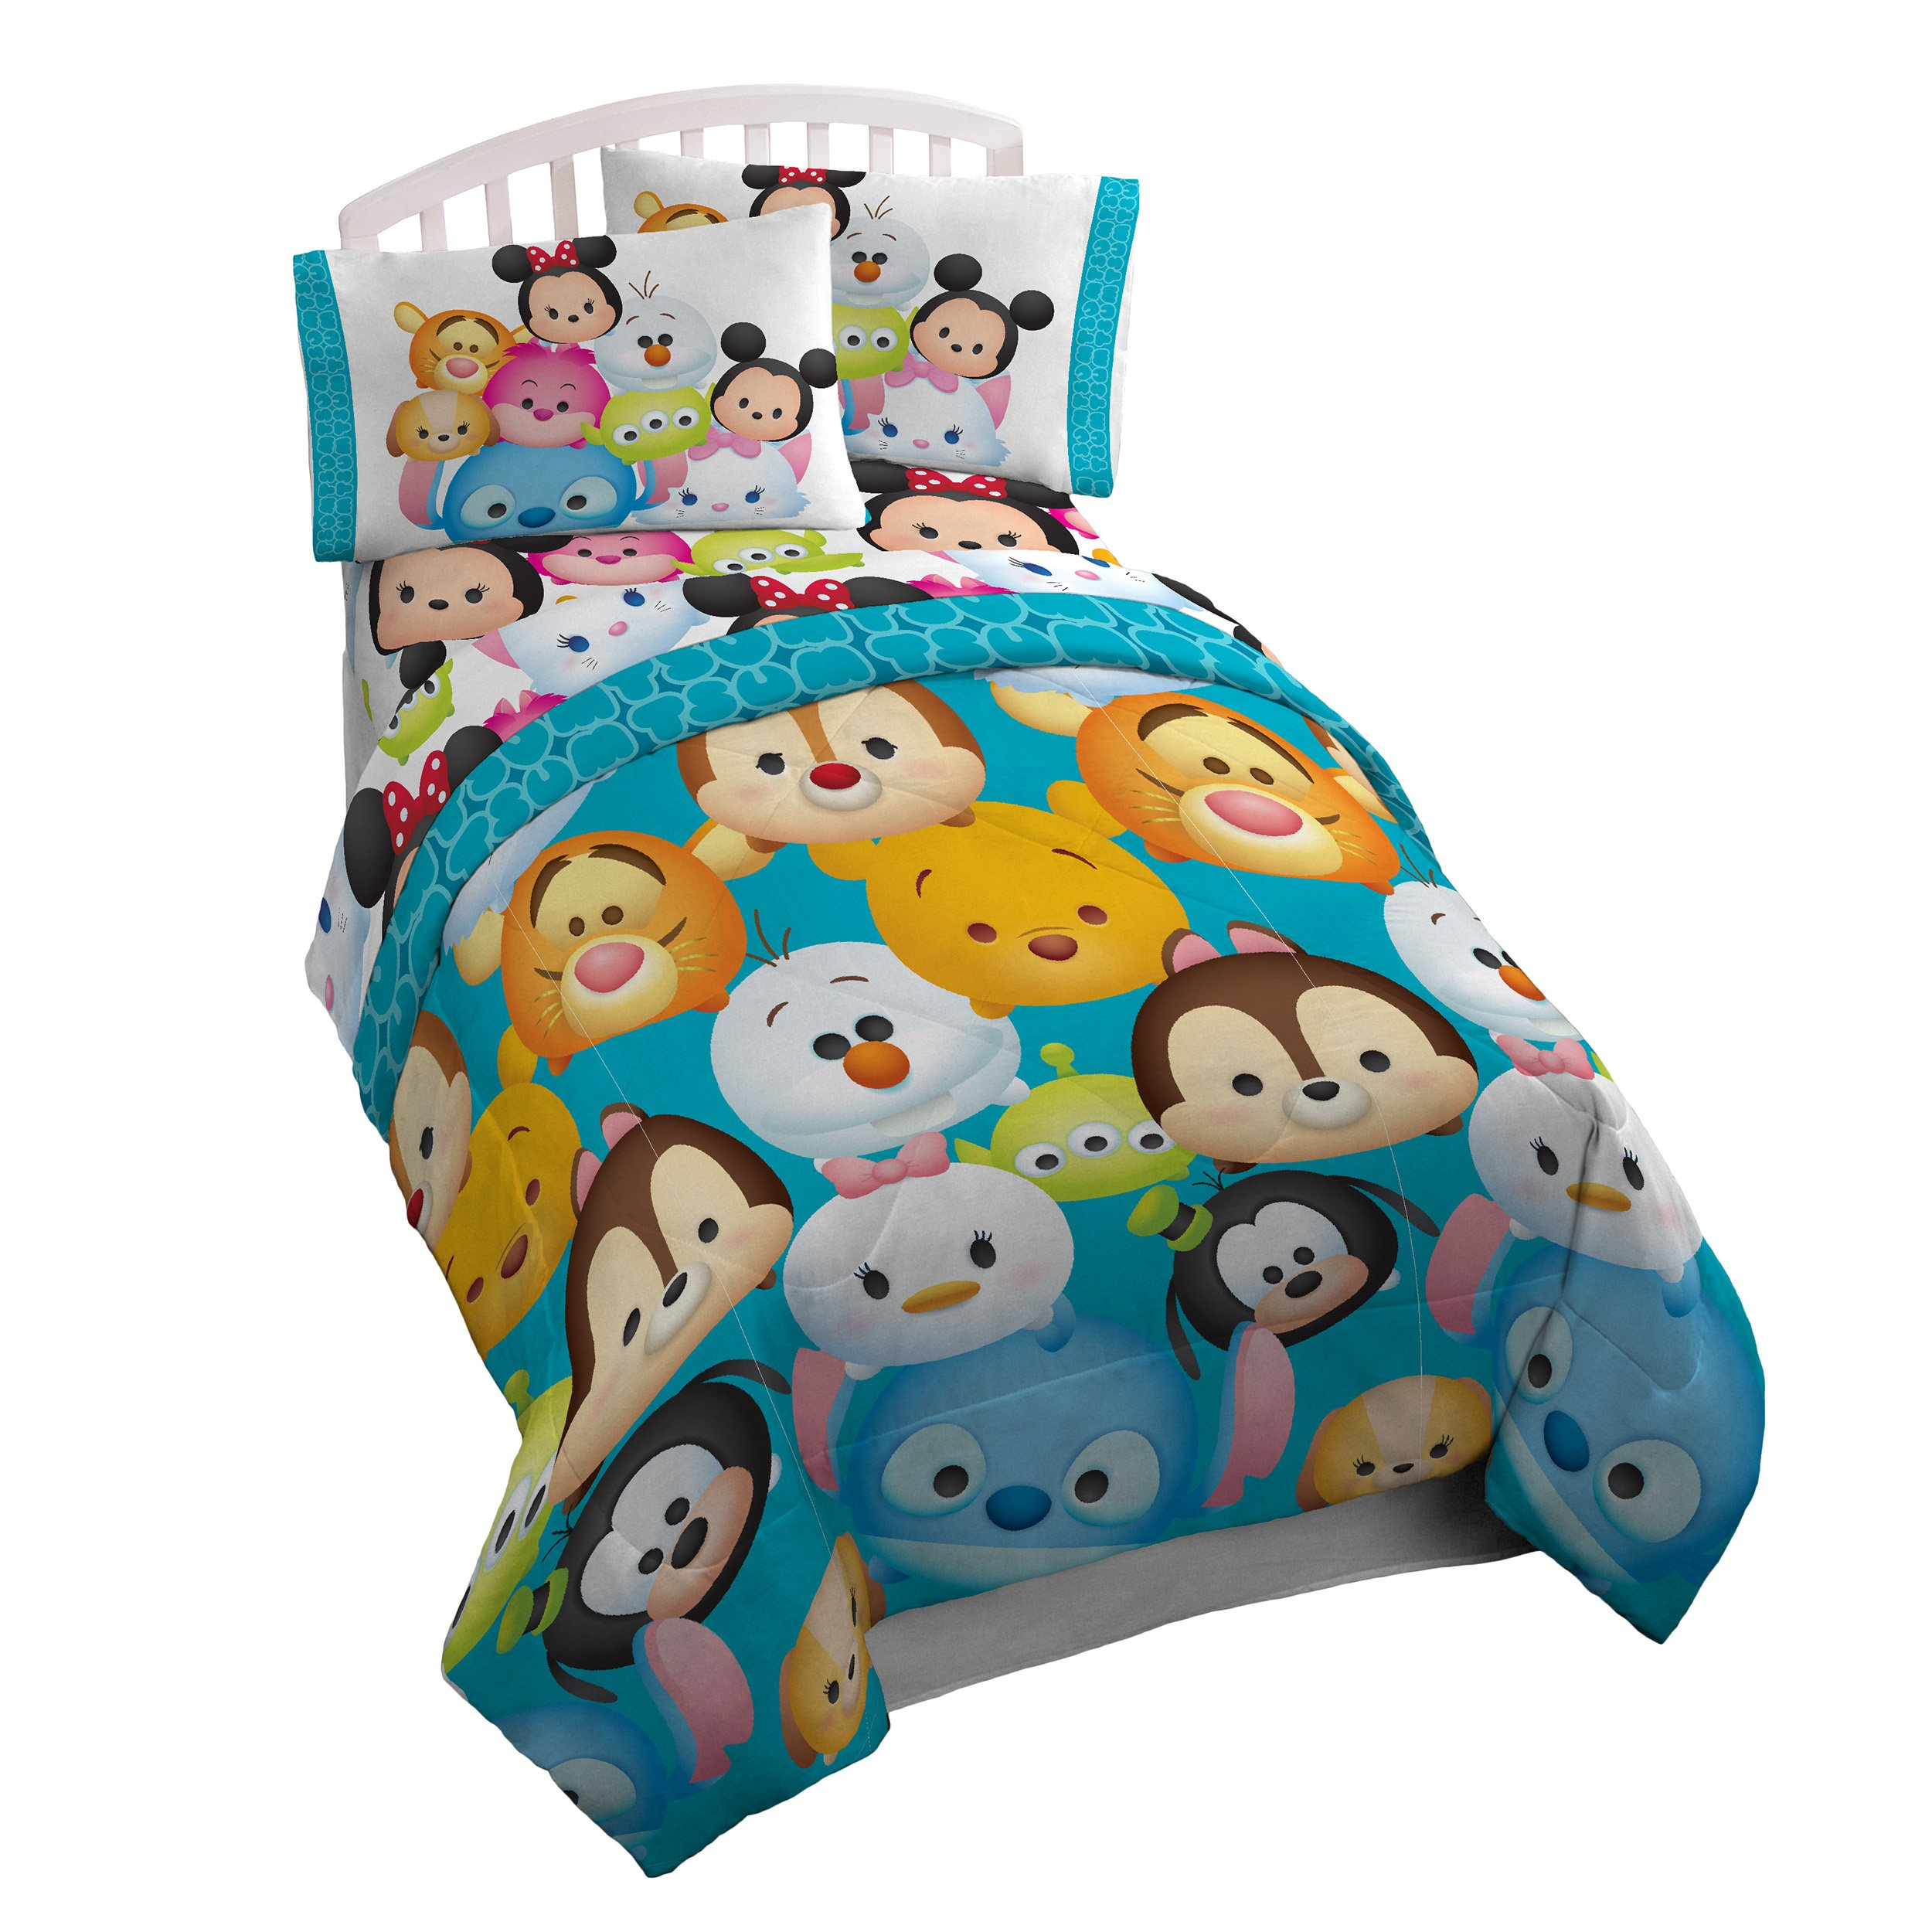 Disney Tsum Tsum 'Character' Teal Microfiber Twin Reversible Comforter